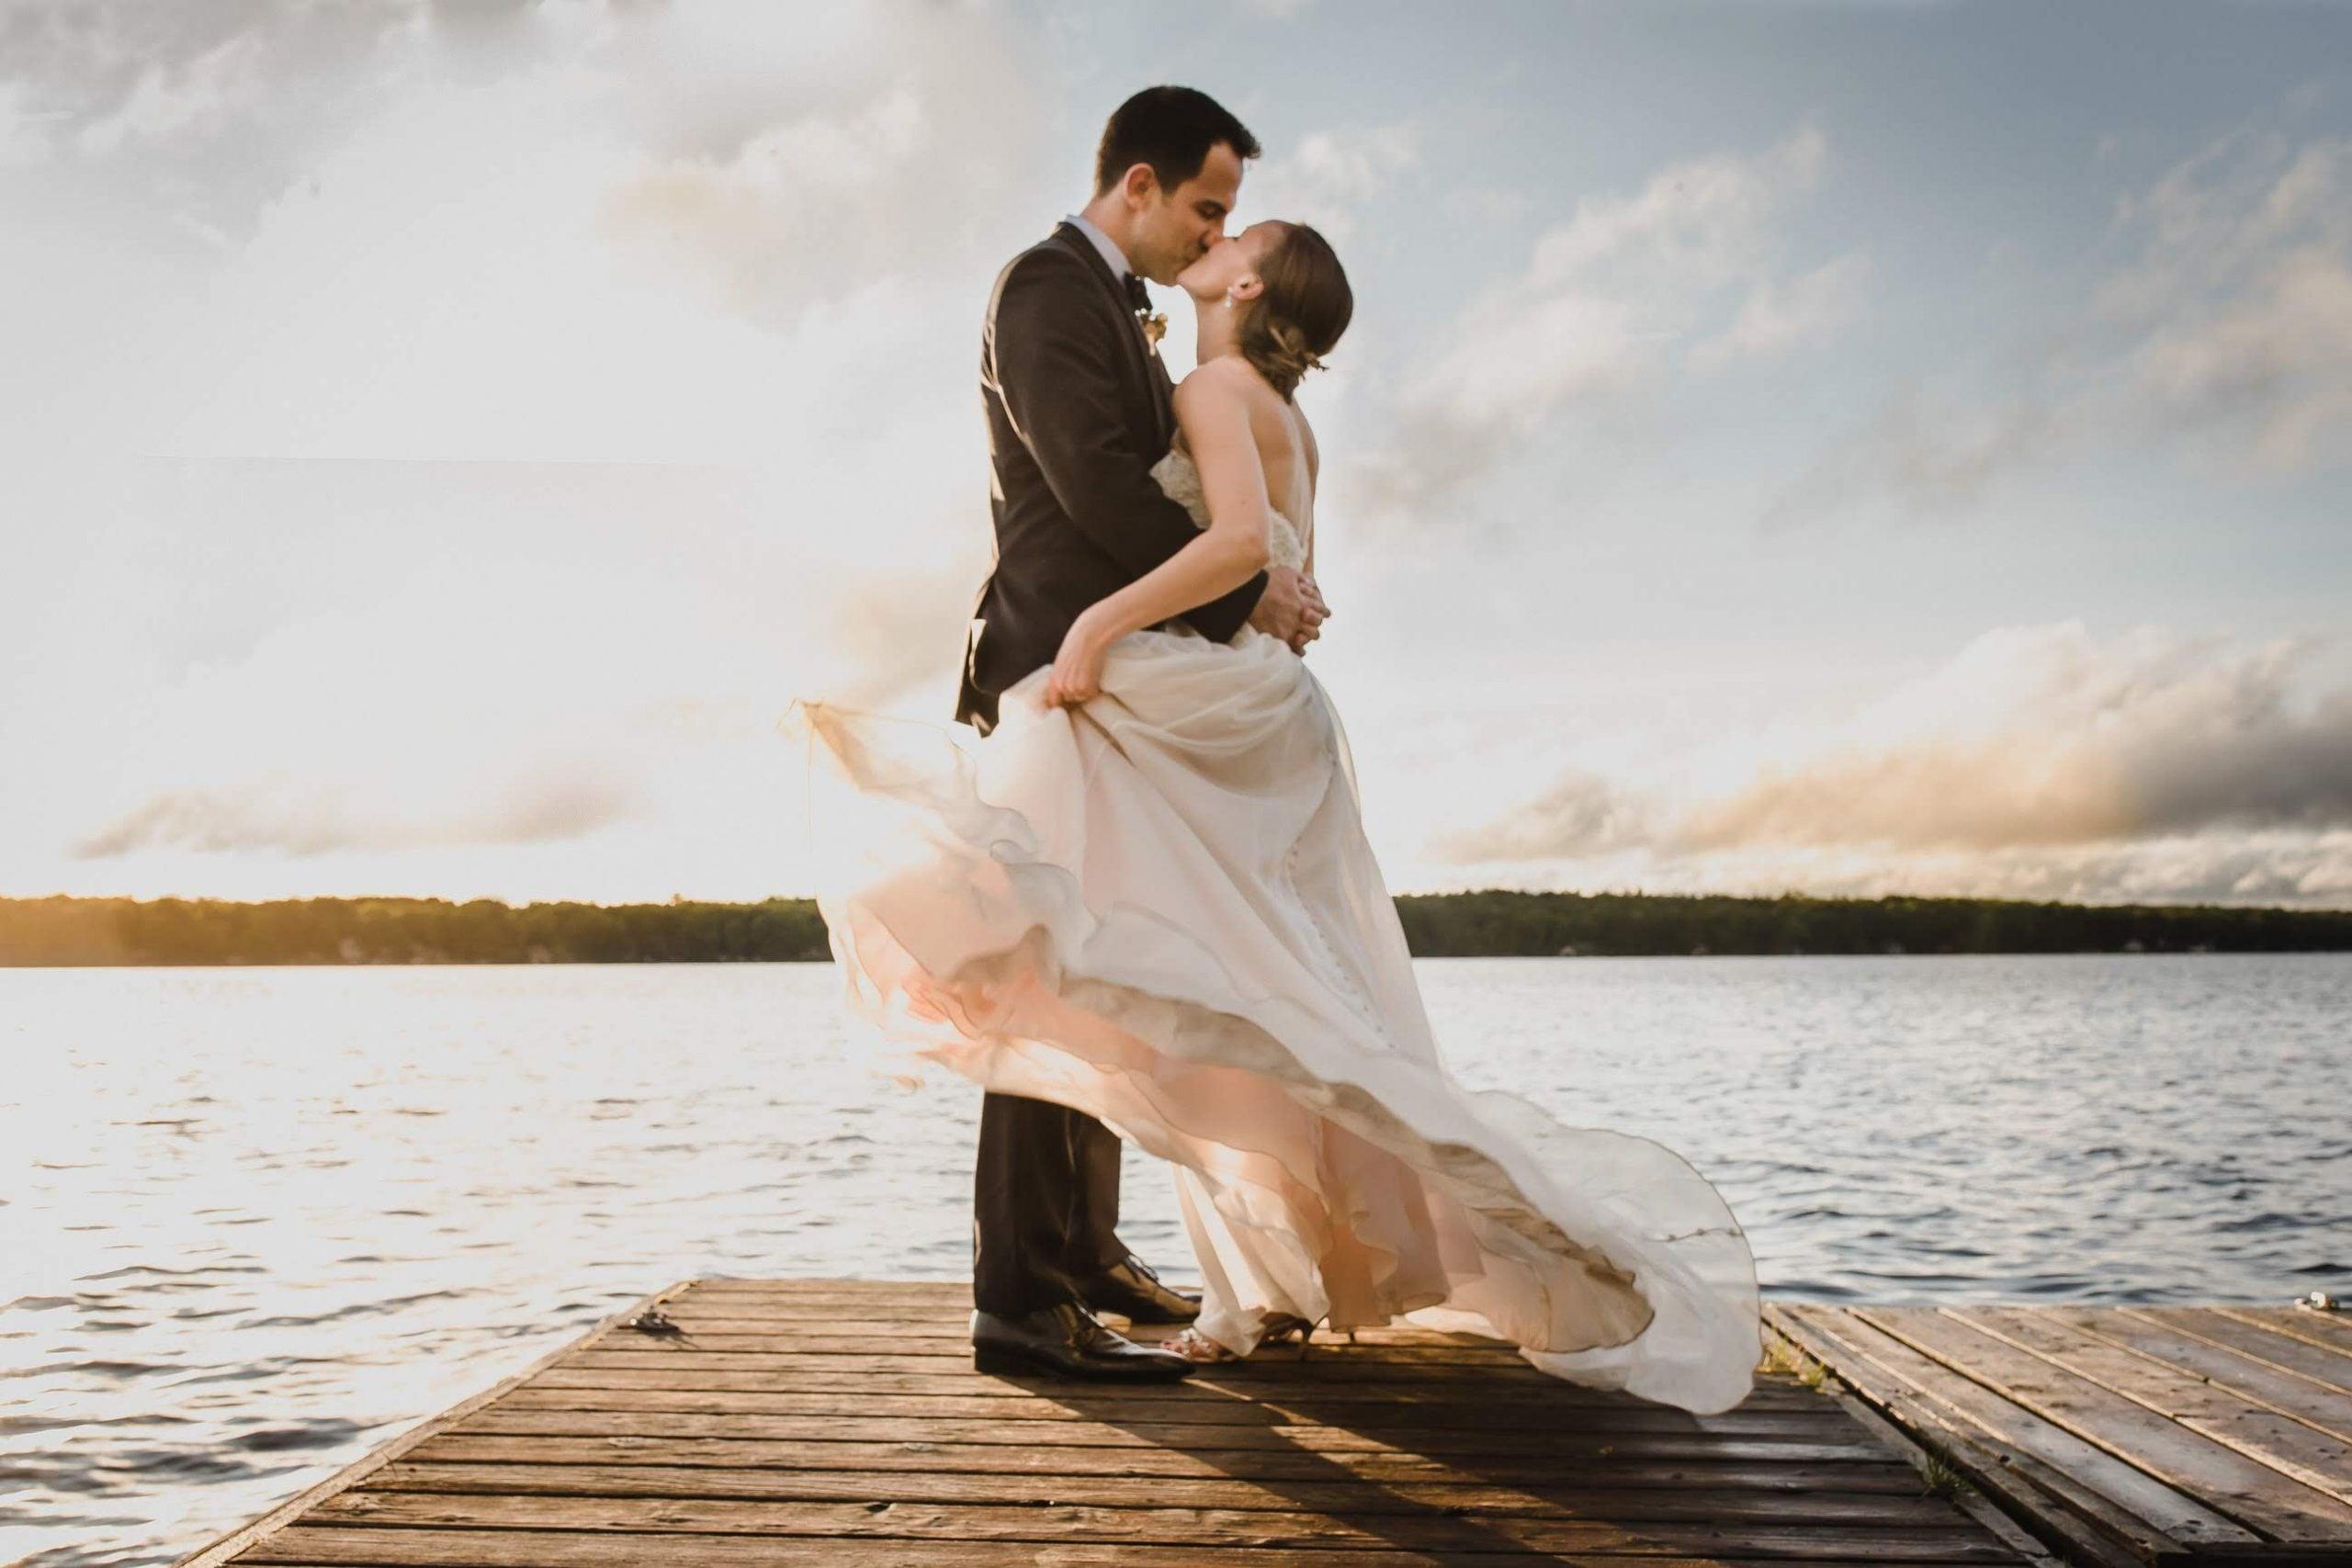 intimate wedding photographer, cottage wedding